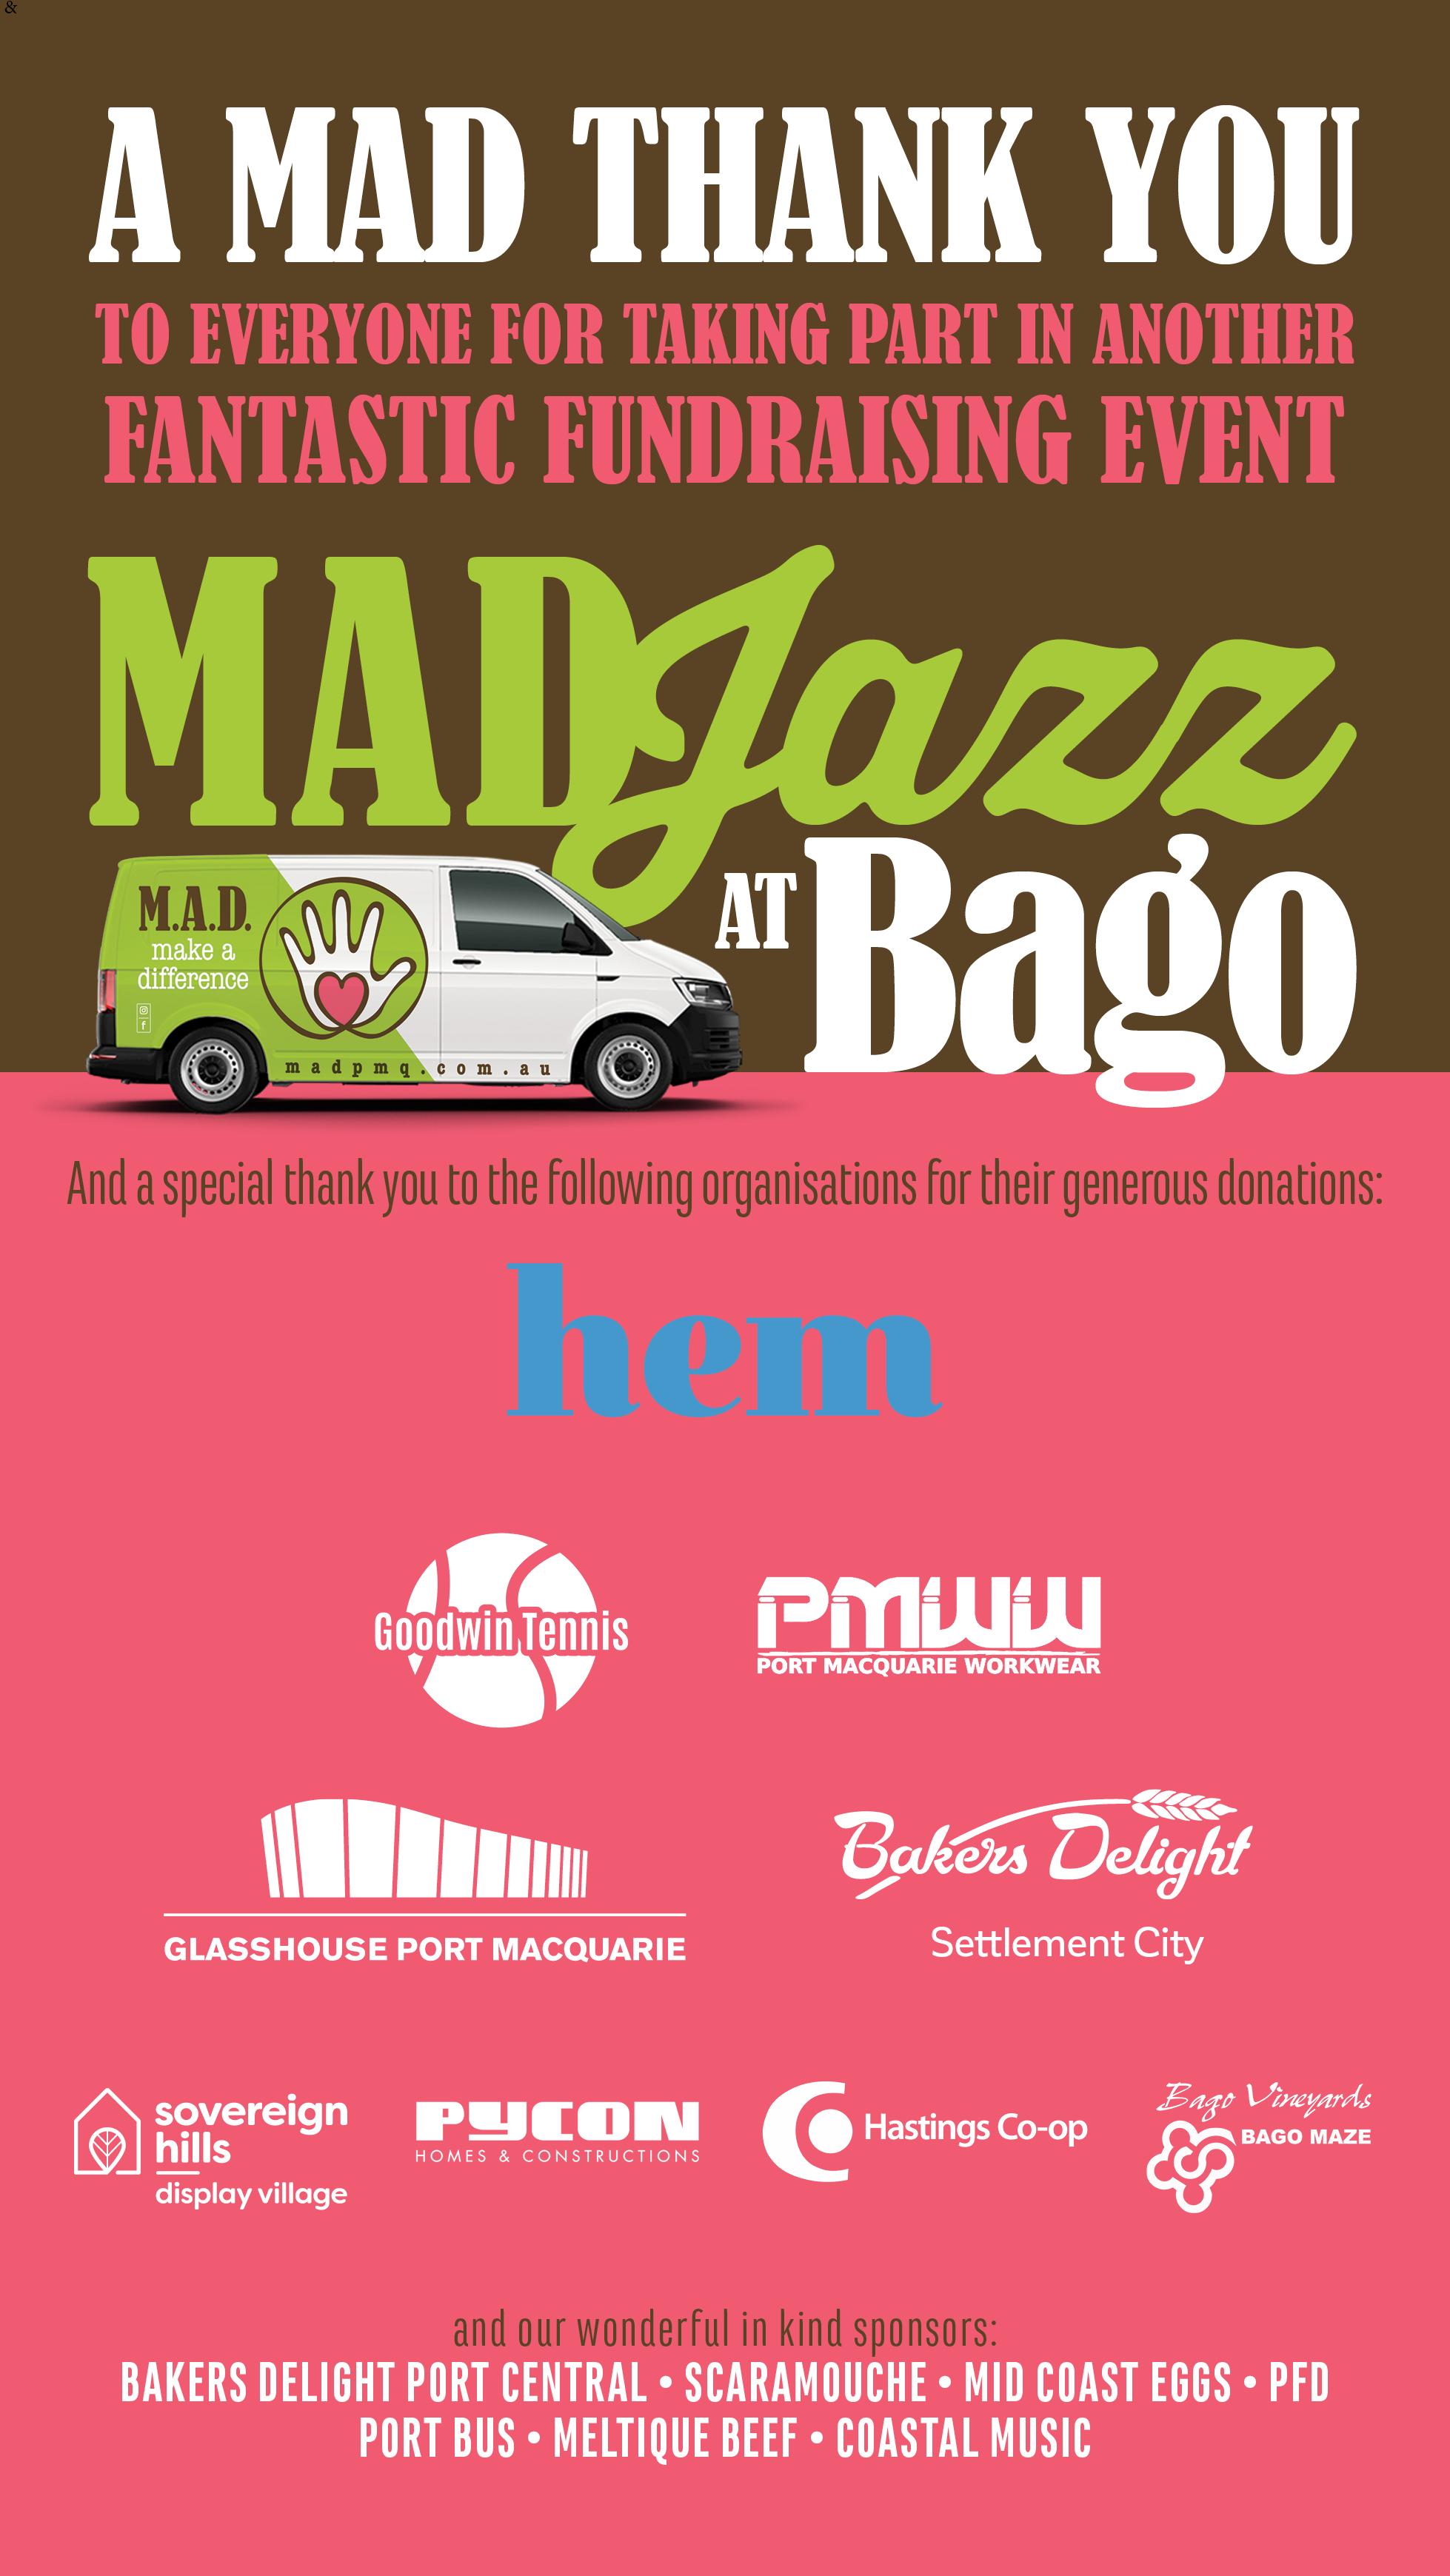 Make-a-Difference-Port-Macquarie-BagoJazz-SUCCESS-SPONSOR-THANKYOU-image